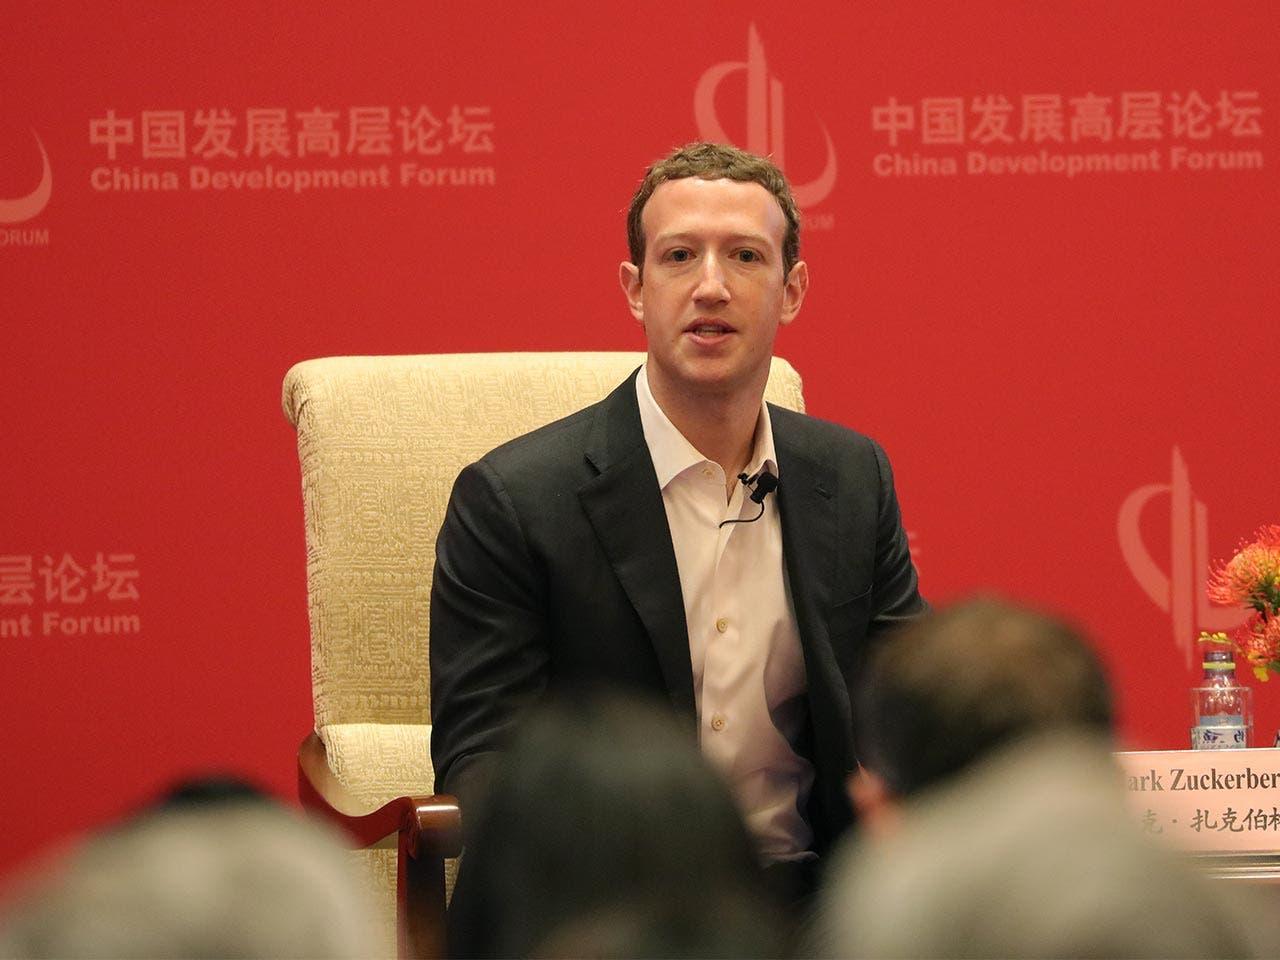 Mark Zuckerberg | VCG/Getty Images